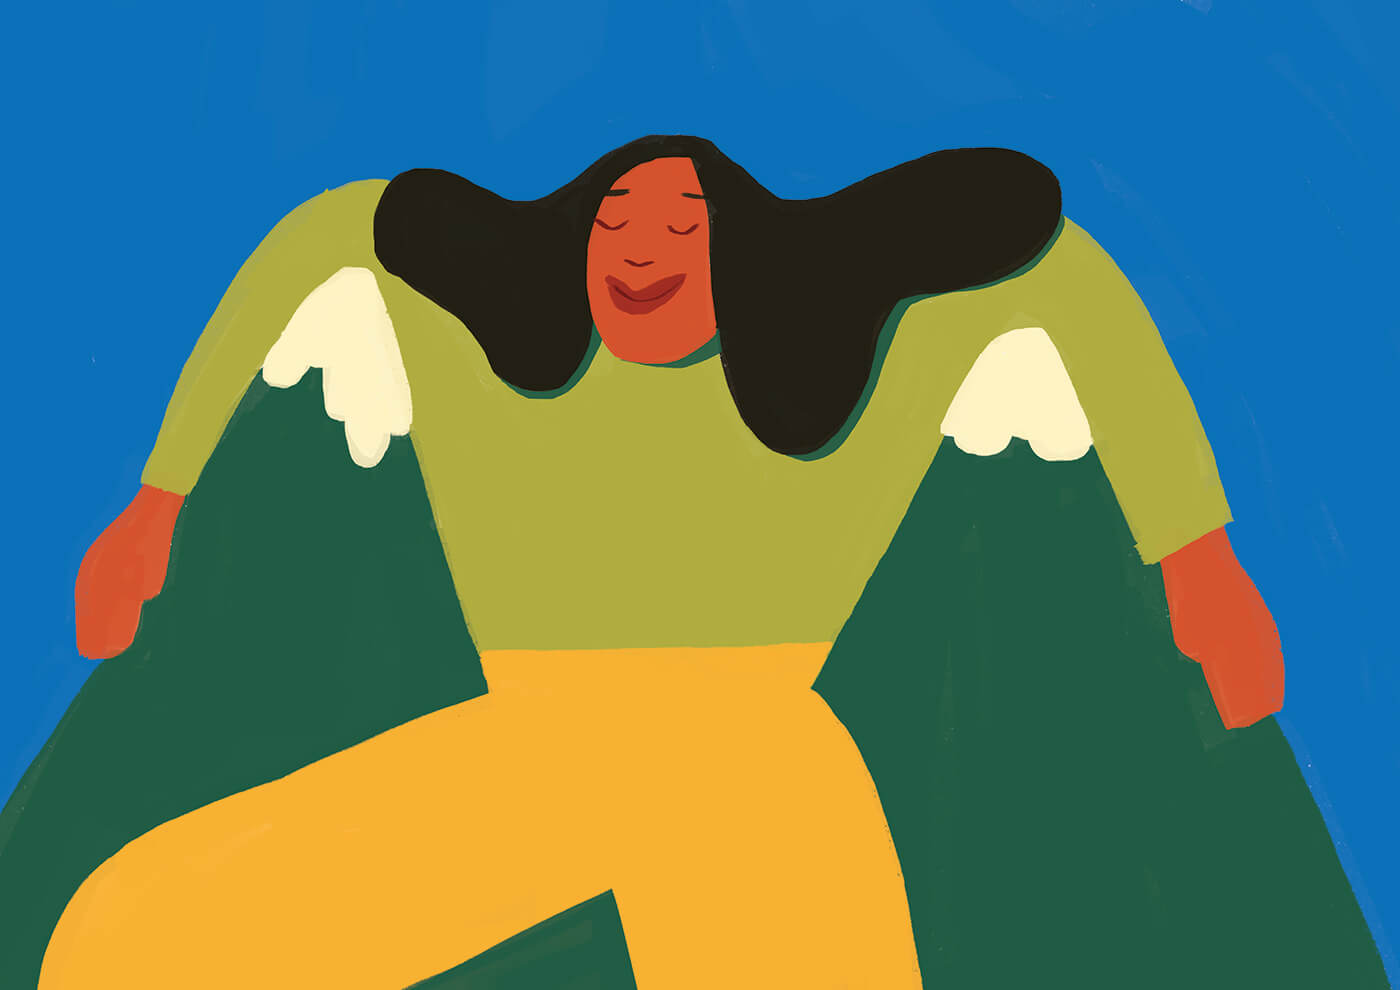 woman-mountains-nature-peaceful-illustration-violeta-noy